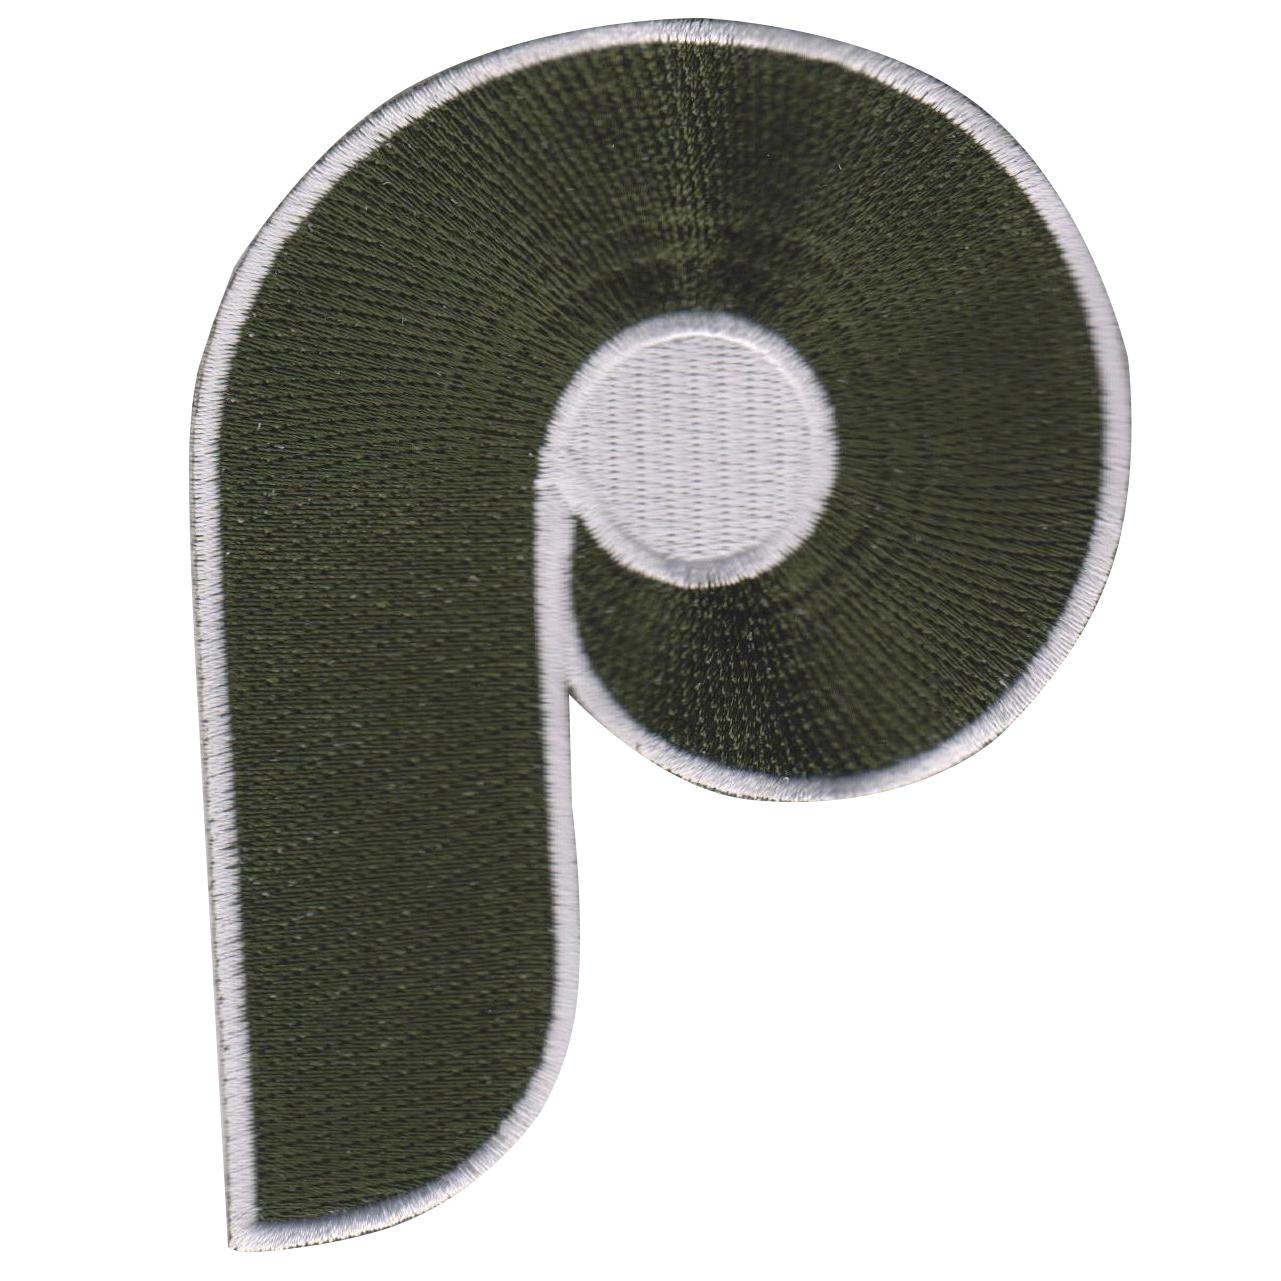 Philadelphia Phillies 2018 Memorial Day USMC Logo Patch - No Size